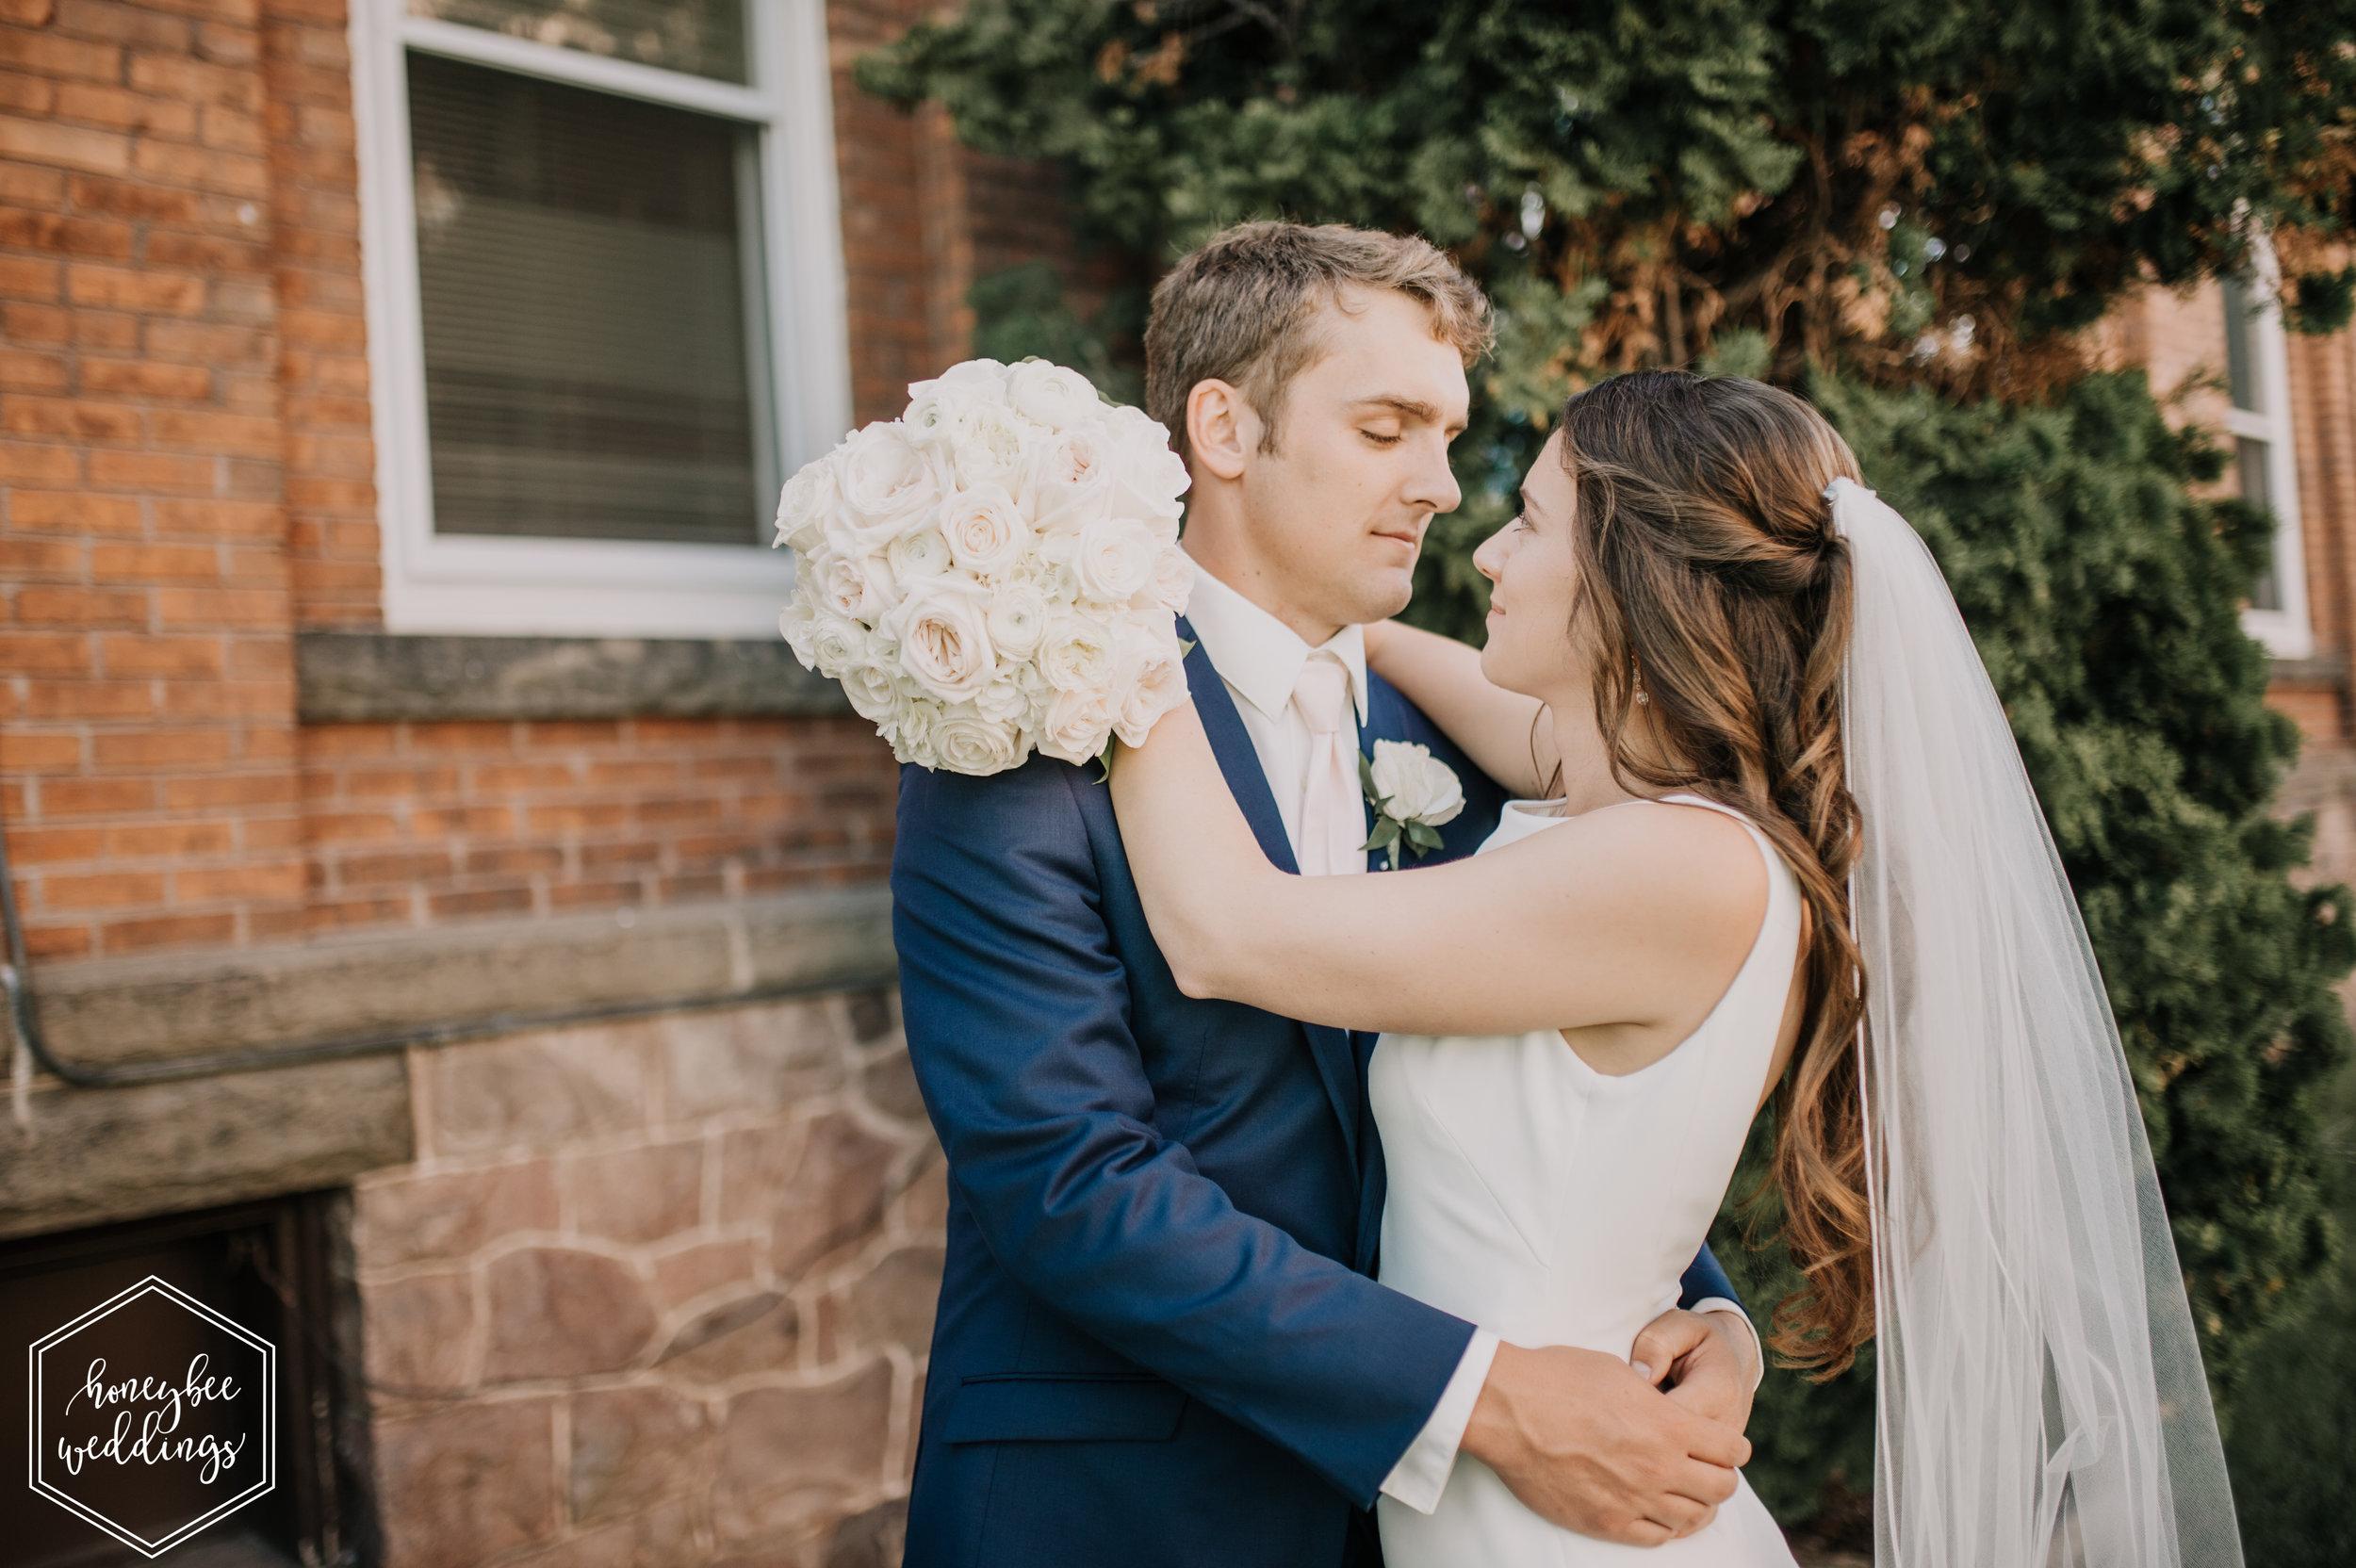 213 Montana Wedding Photographer_St. Francis Wedding_Tifani Zanto + Ryan Burke -6865.jpg